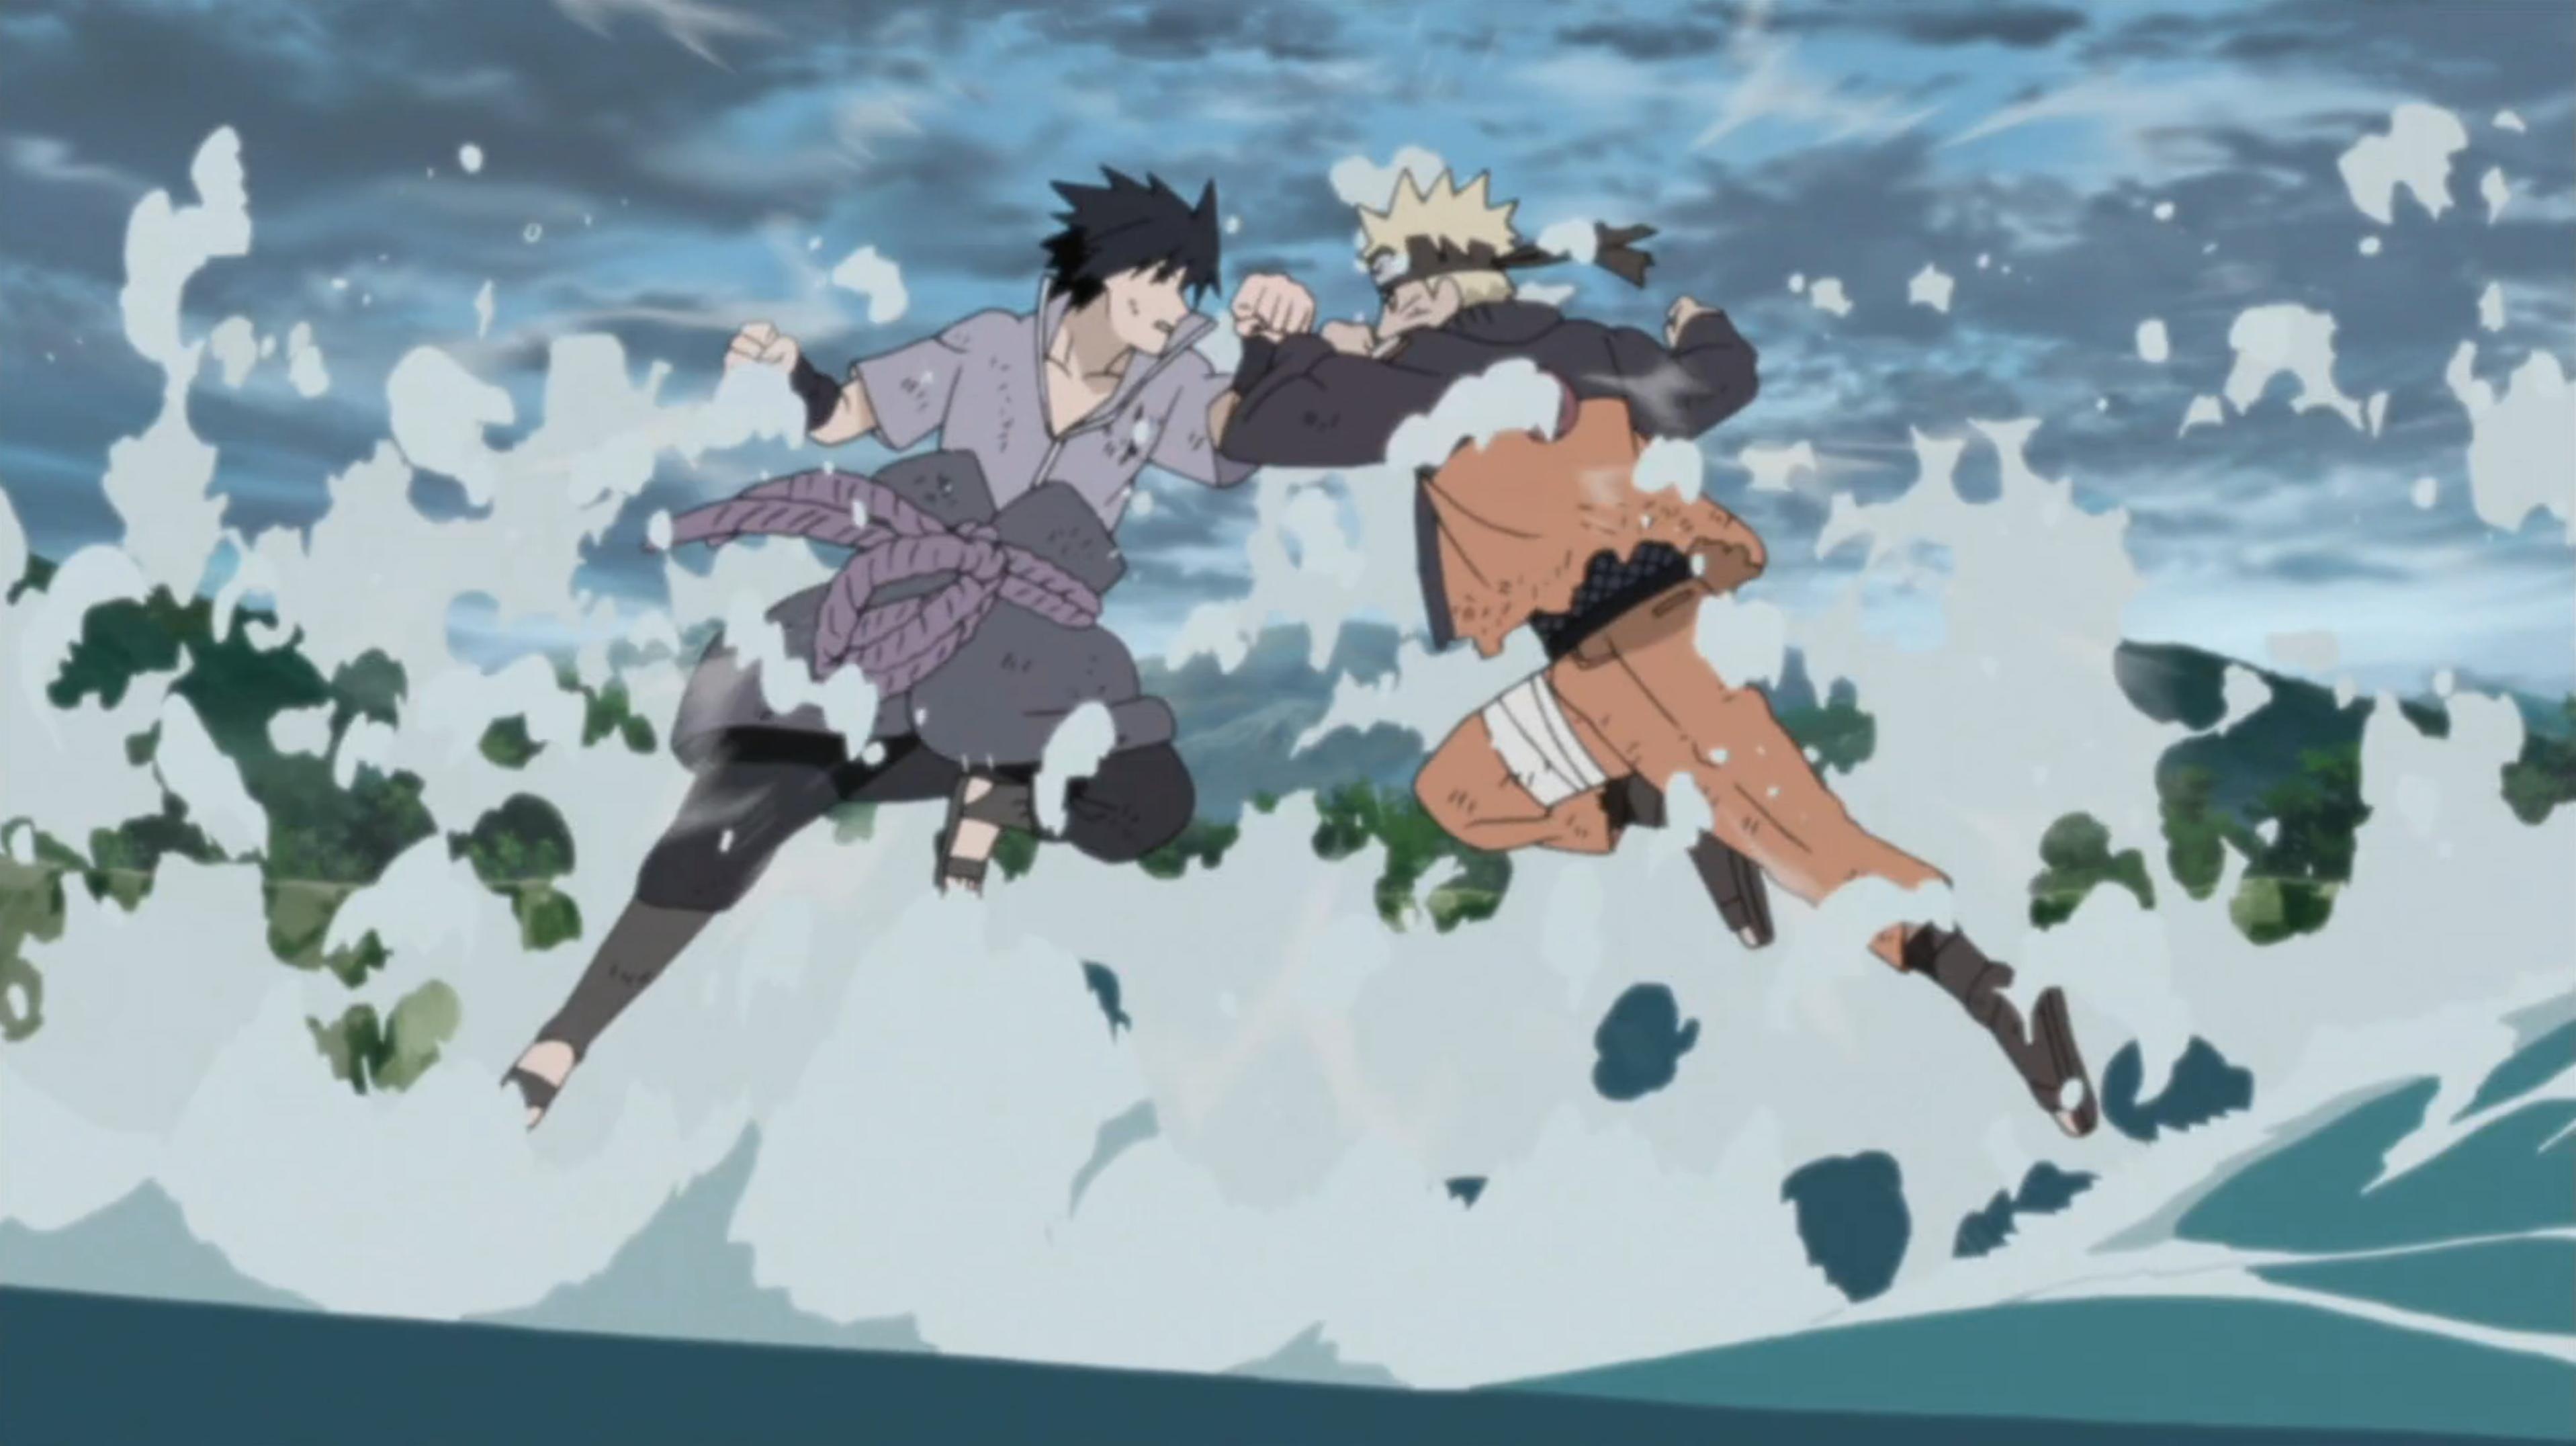 Kaguya ōtsutsuki Strikes Narutopedia Fandom